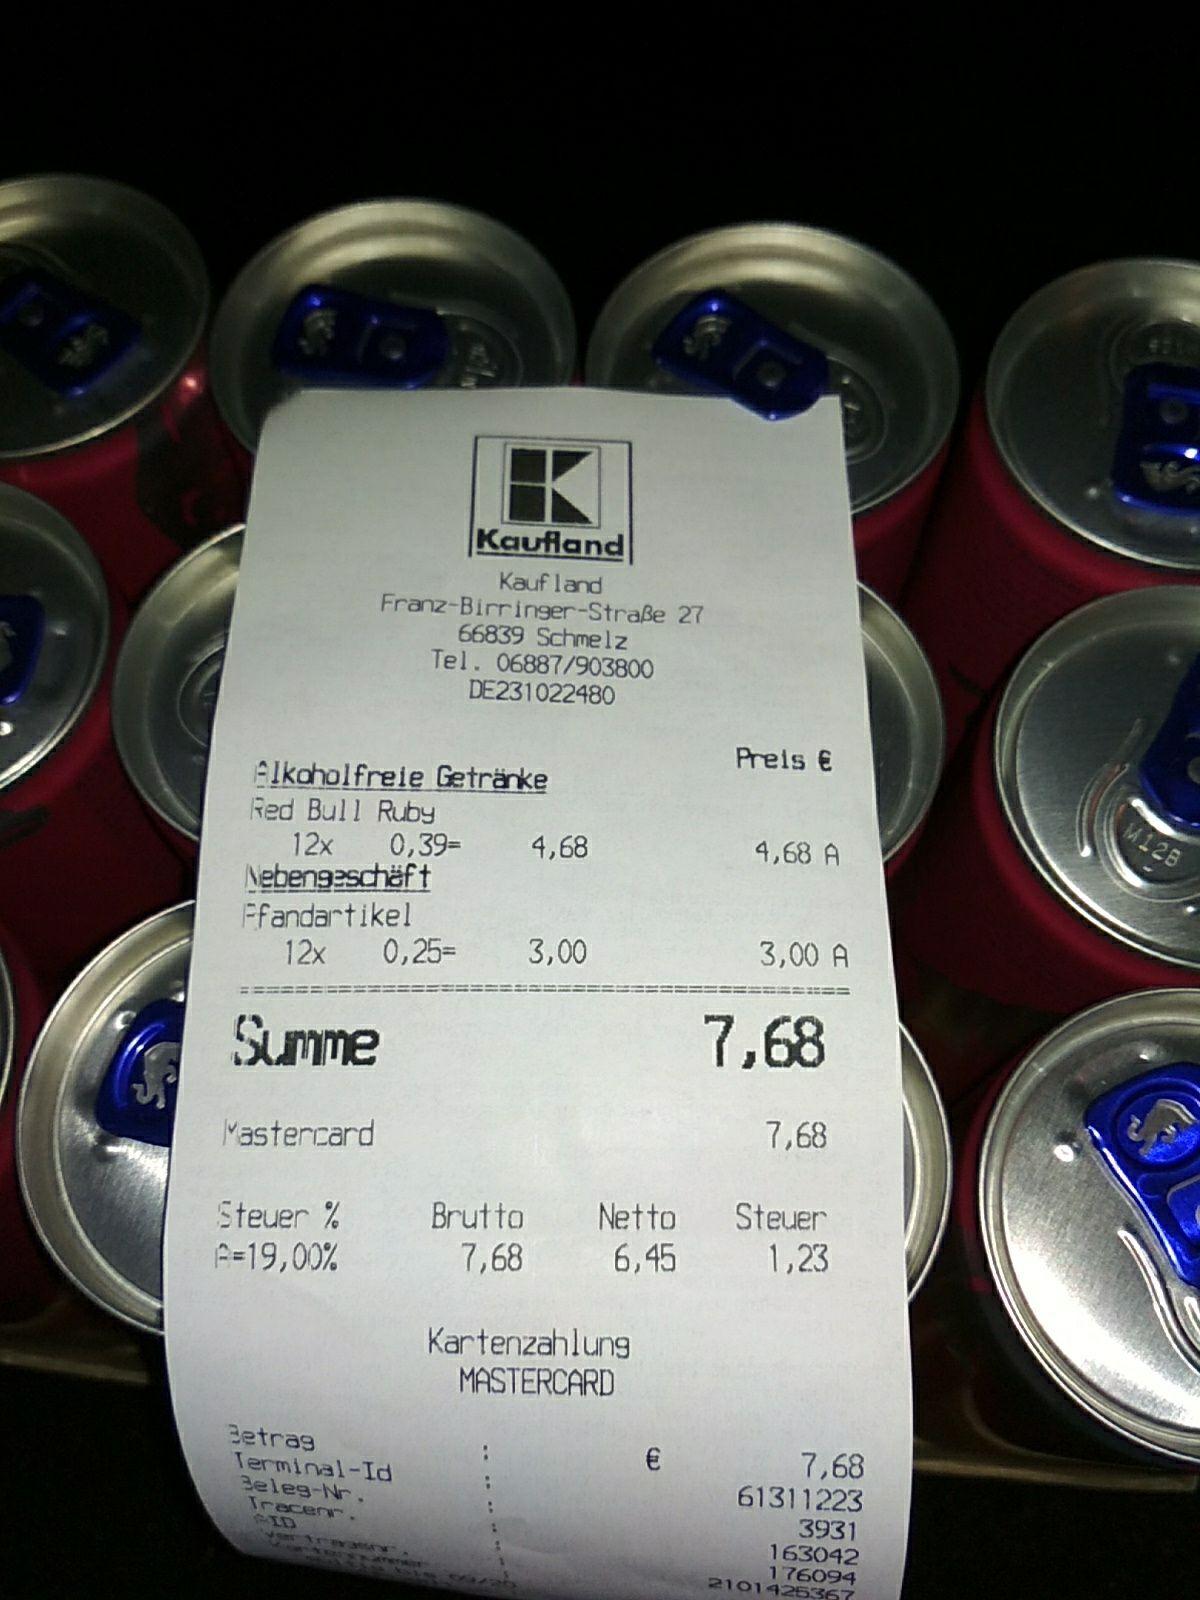 Lokal?] Red Bull Summer / Ruby 0,39€ @ Kaufland Schmelz (MHD 19.04 ...